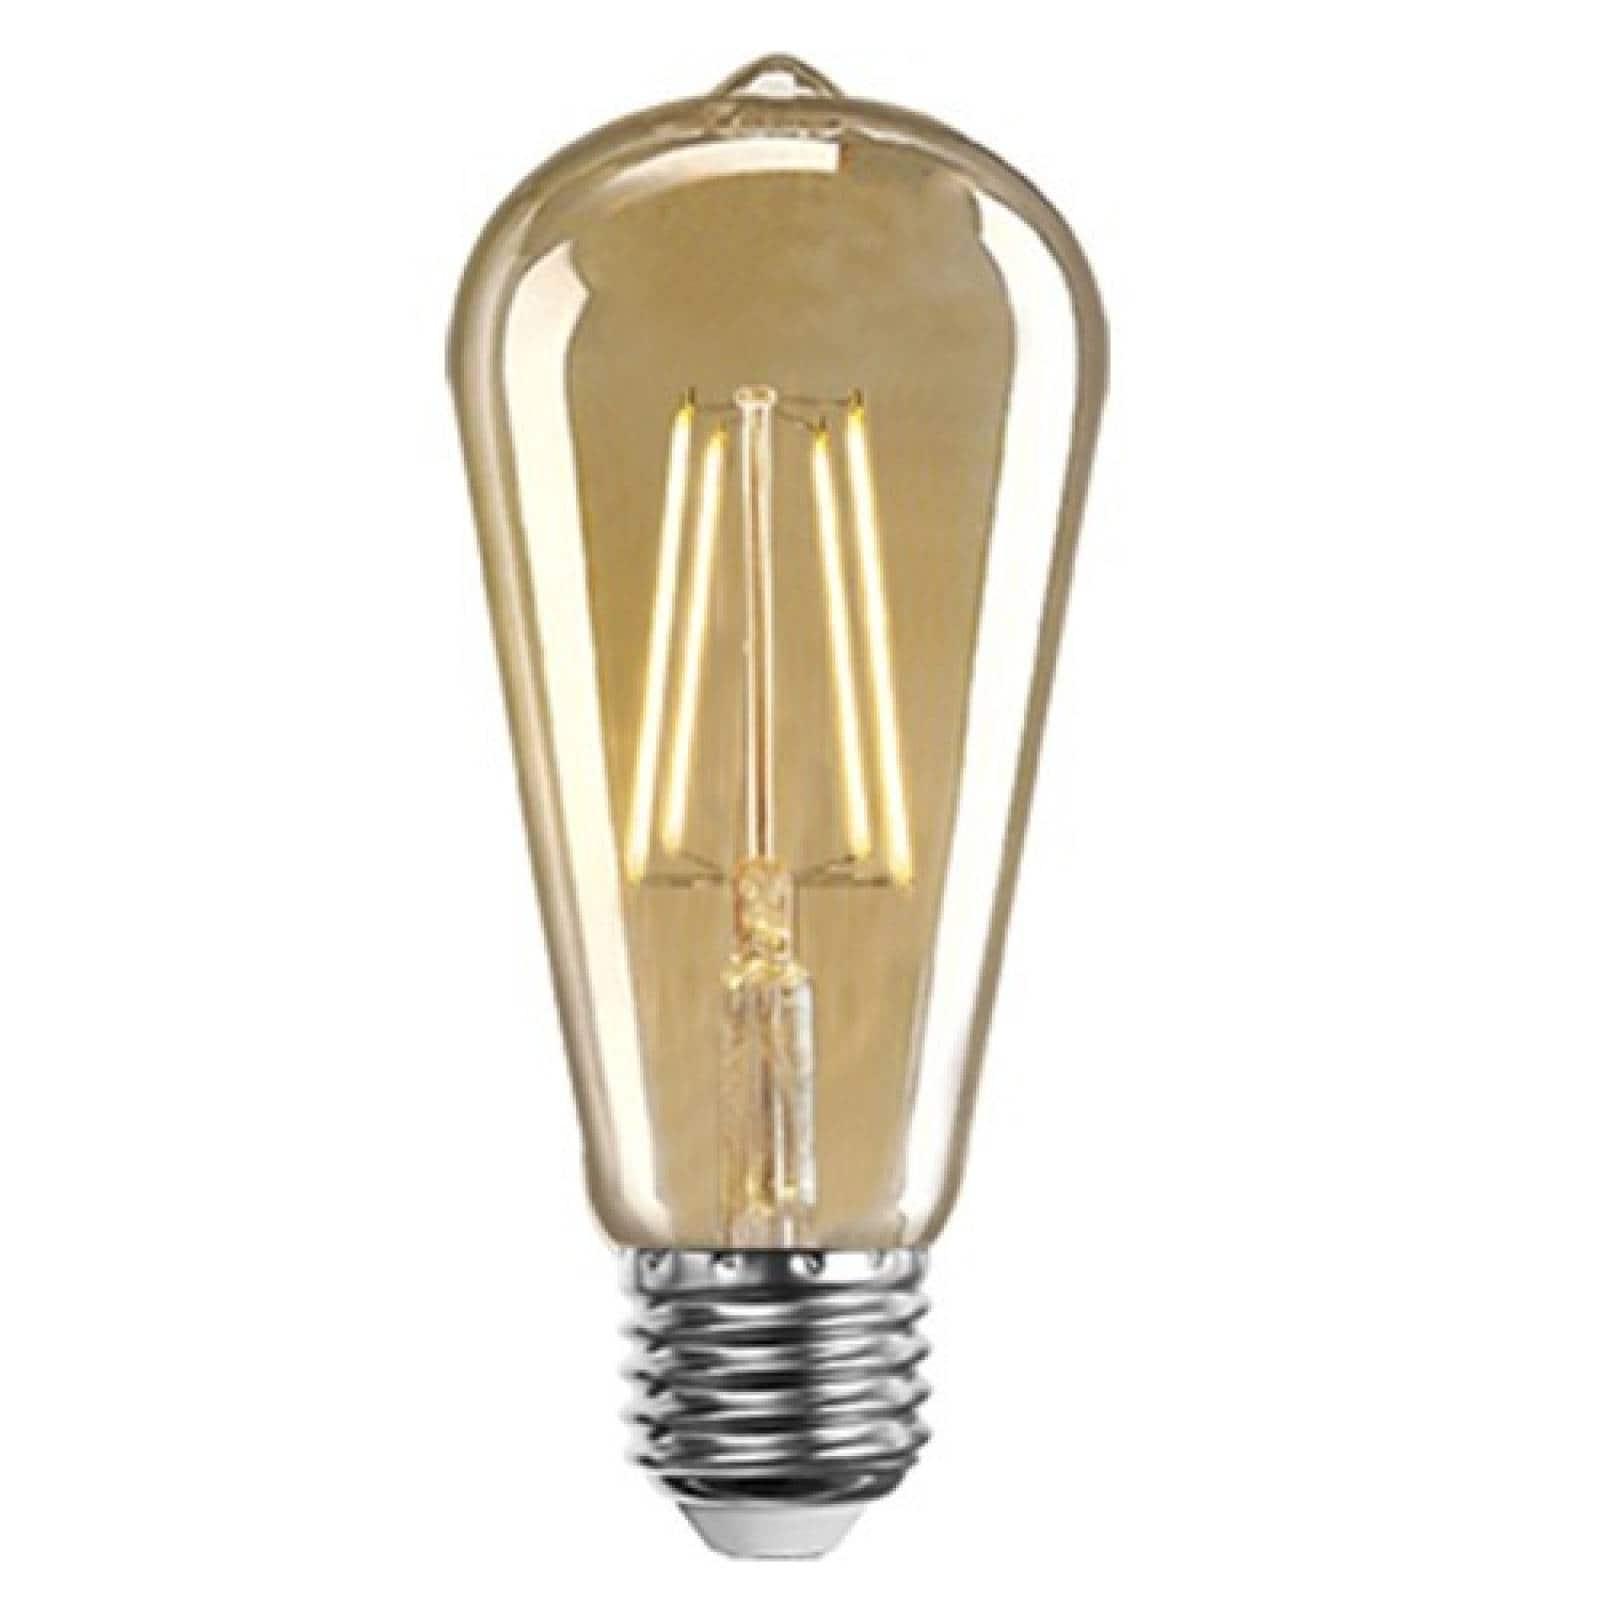 Foco Filamento Iluminación Led Ad-5783 Gold 4W Adir